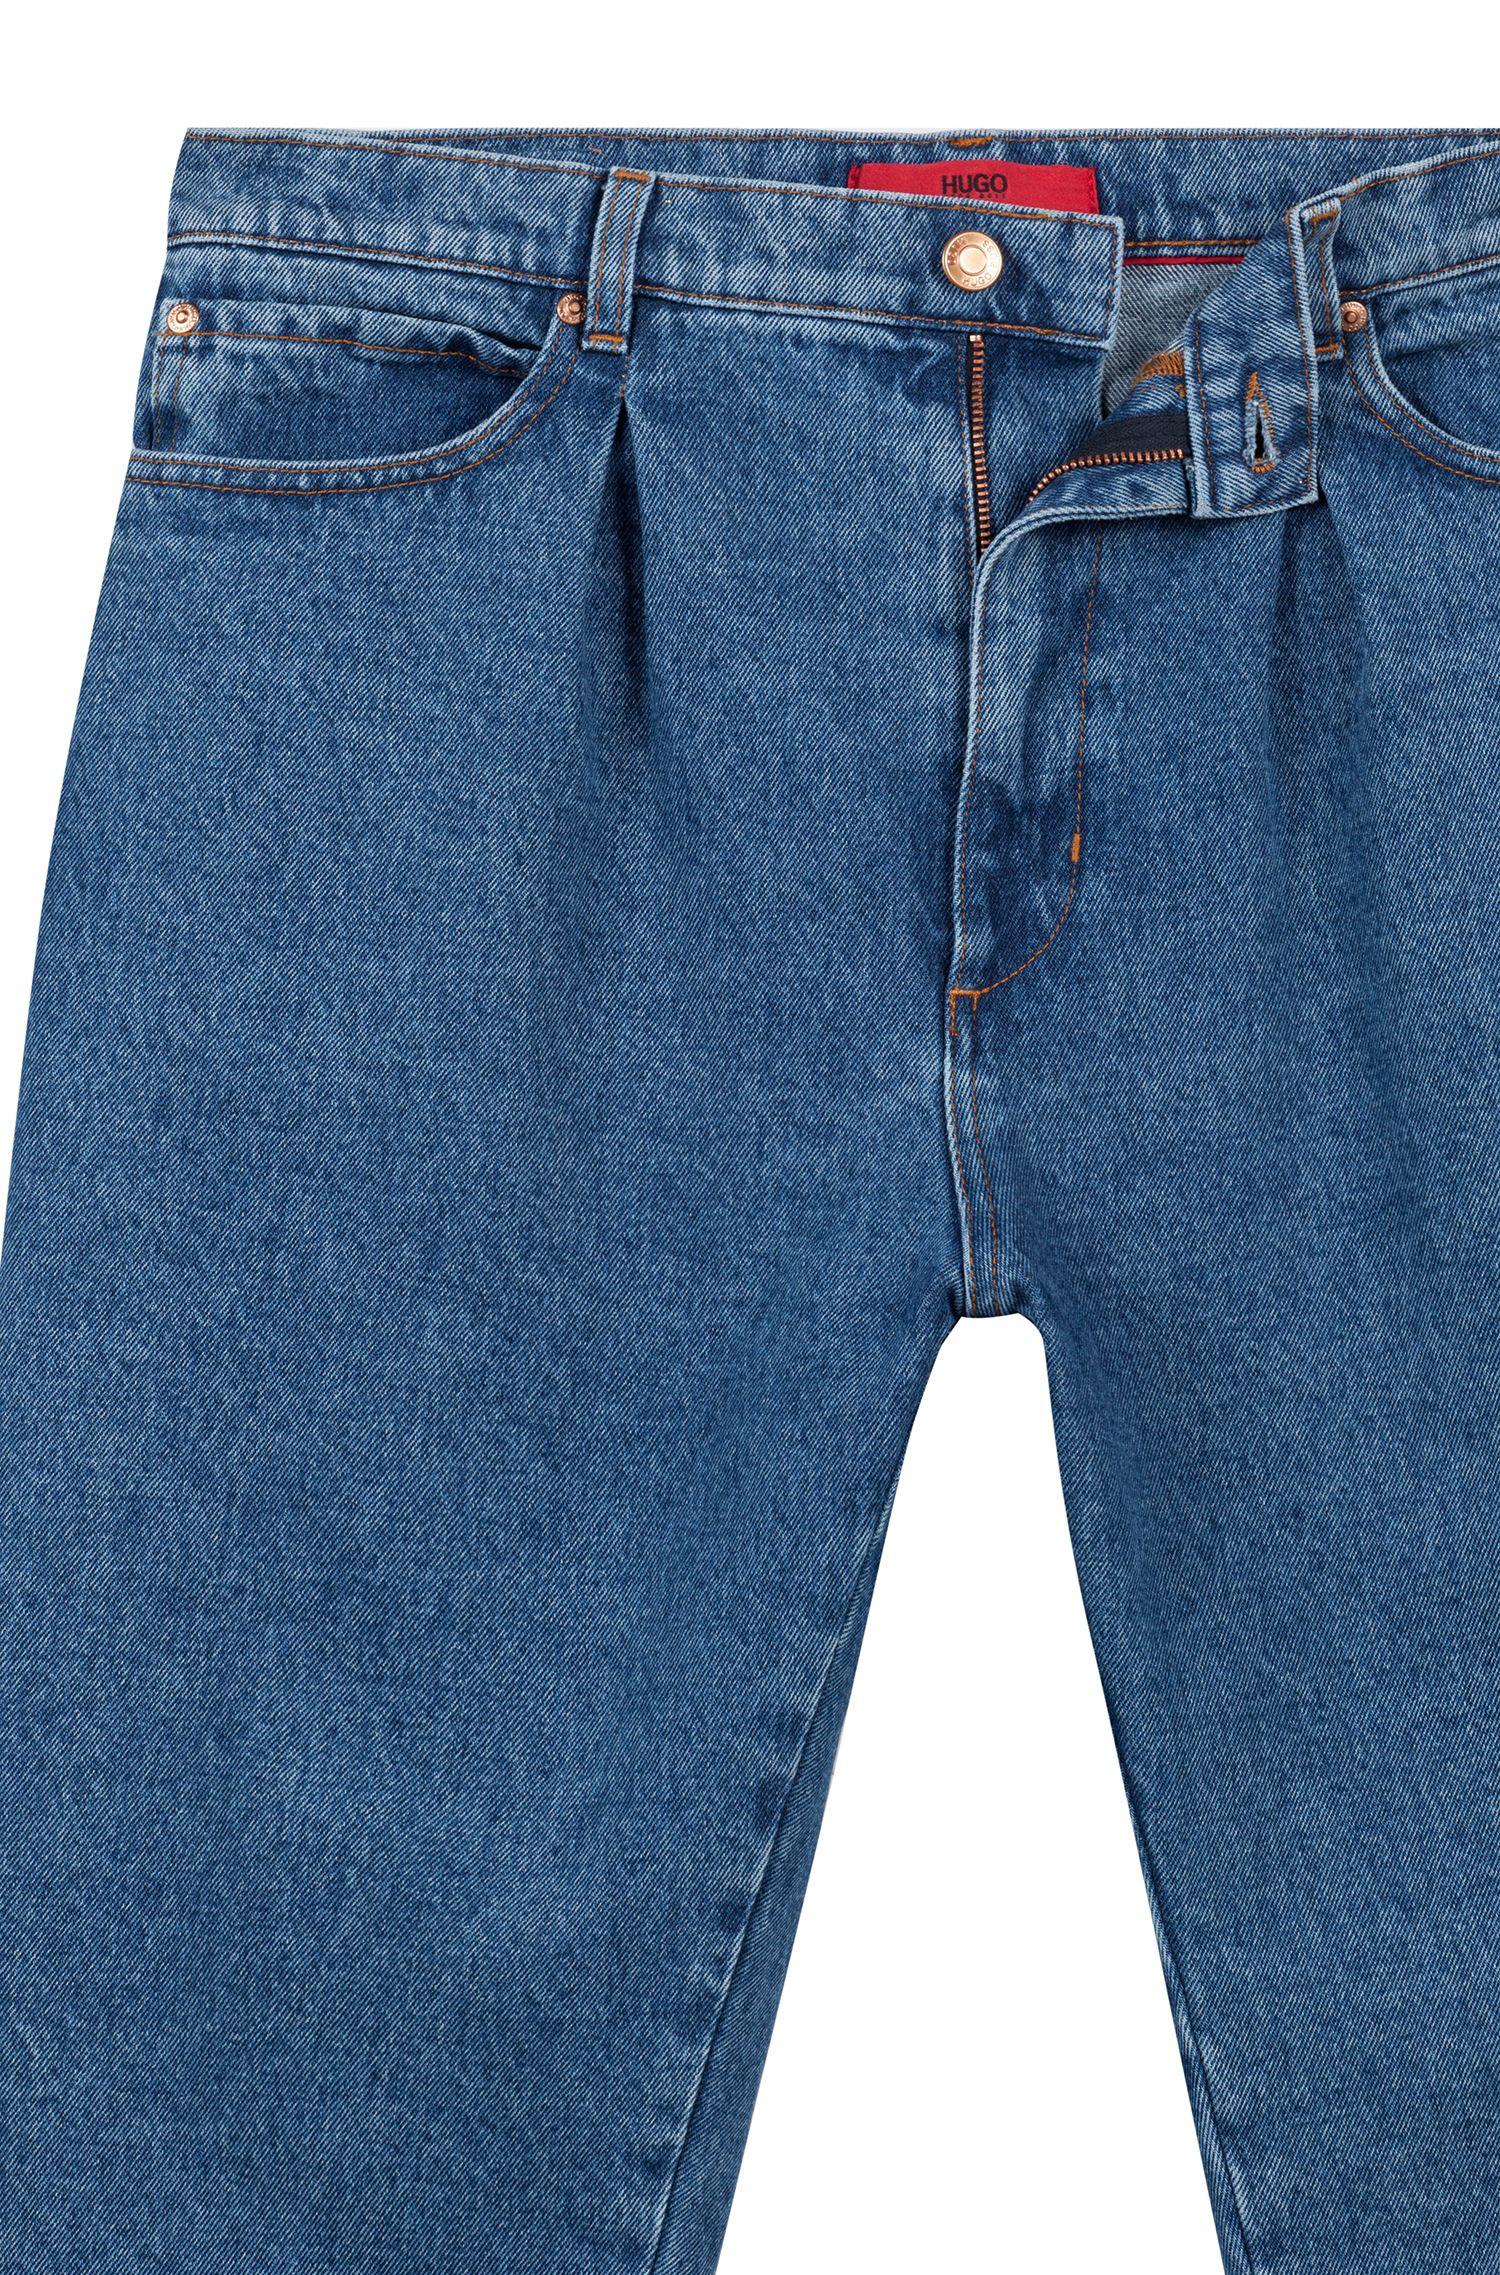 Hugo Boss - Relaxed-Fit Jeans in Cropped-Länge mit Bundfalten - 5